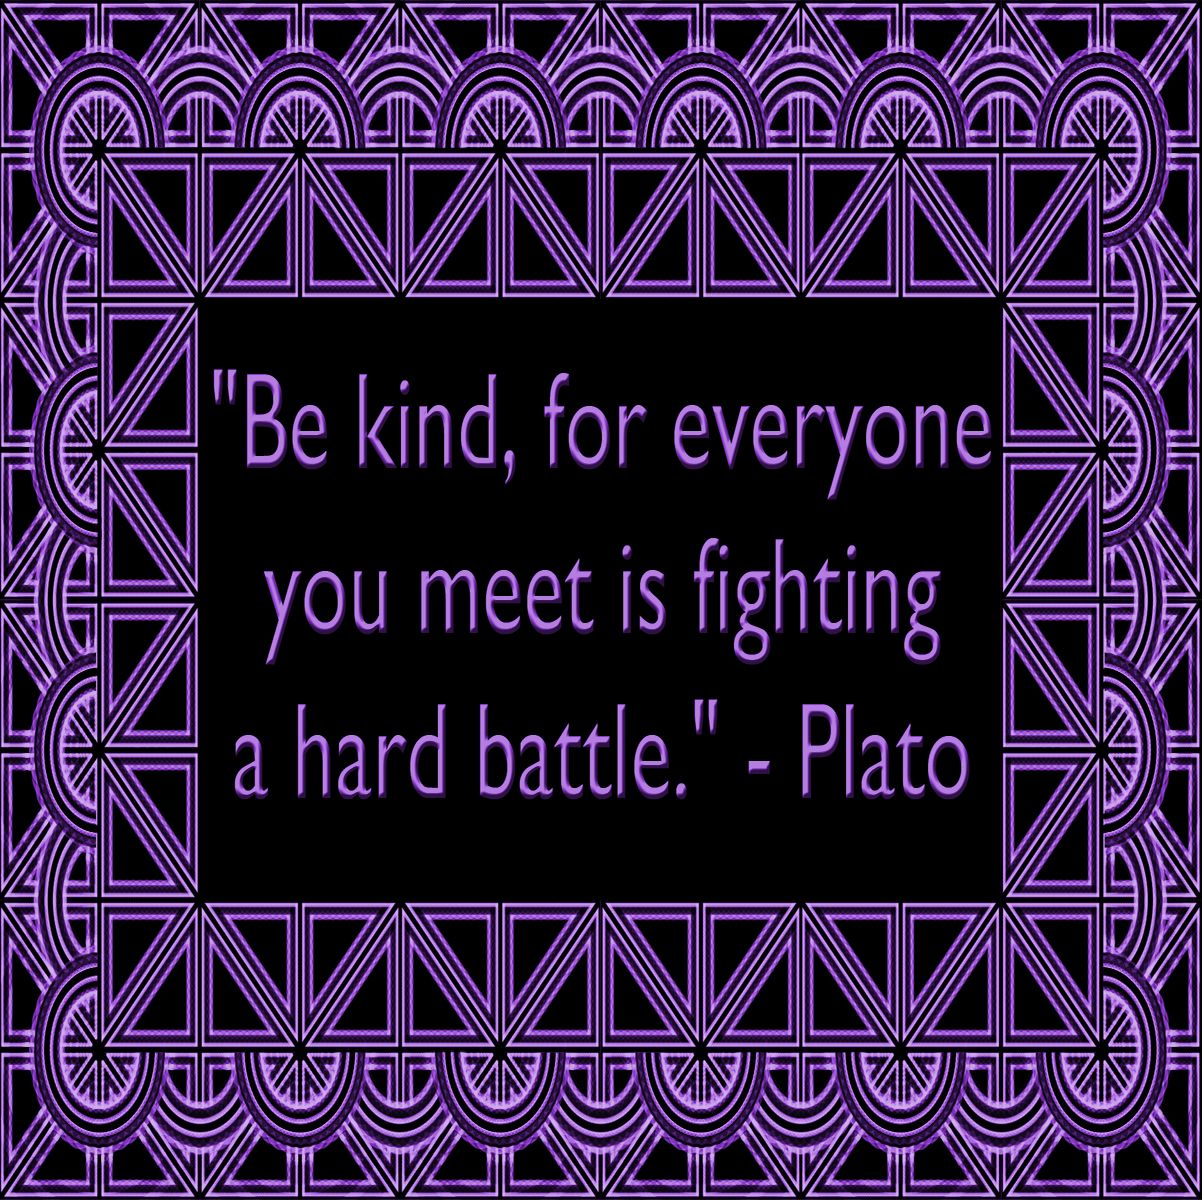 Spirit Day Quote By Jmelahman On Deviantart Anti Bully Quotes Bullying Quotes Anti Bullying